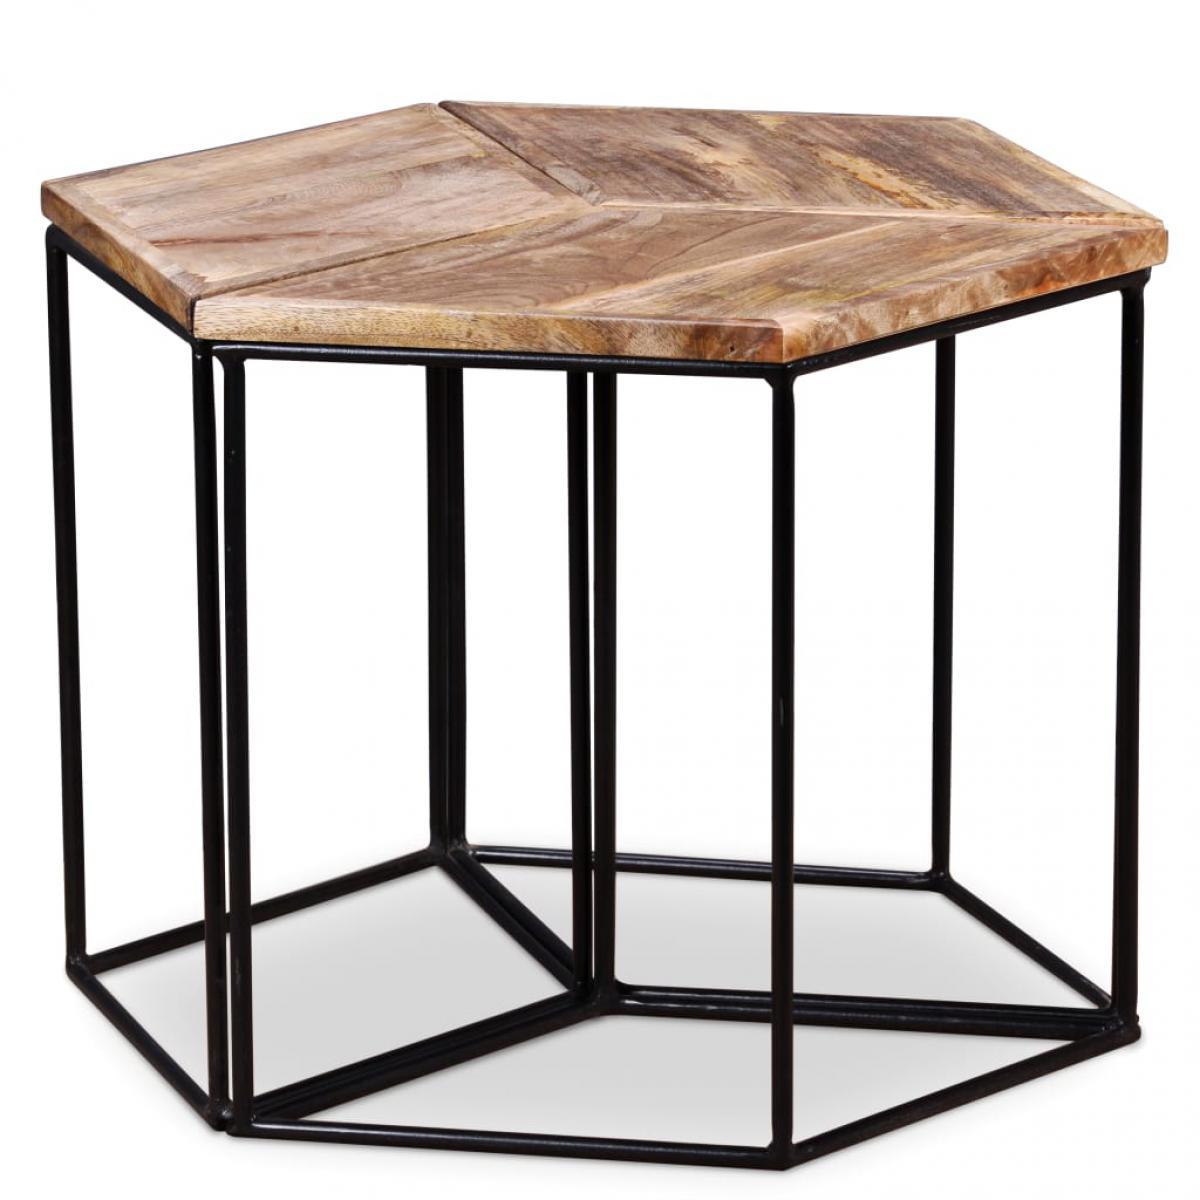 Vidaxl vidaXL Table basse Bois de manguier massif 48 x 48 x 40 cm